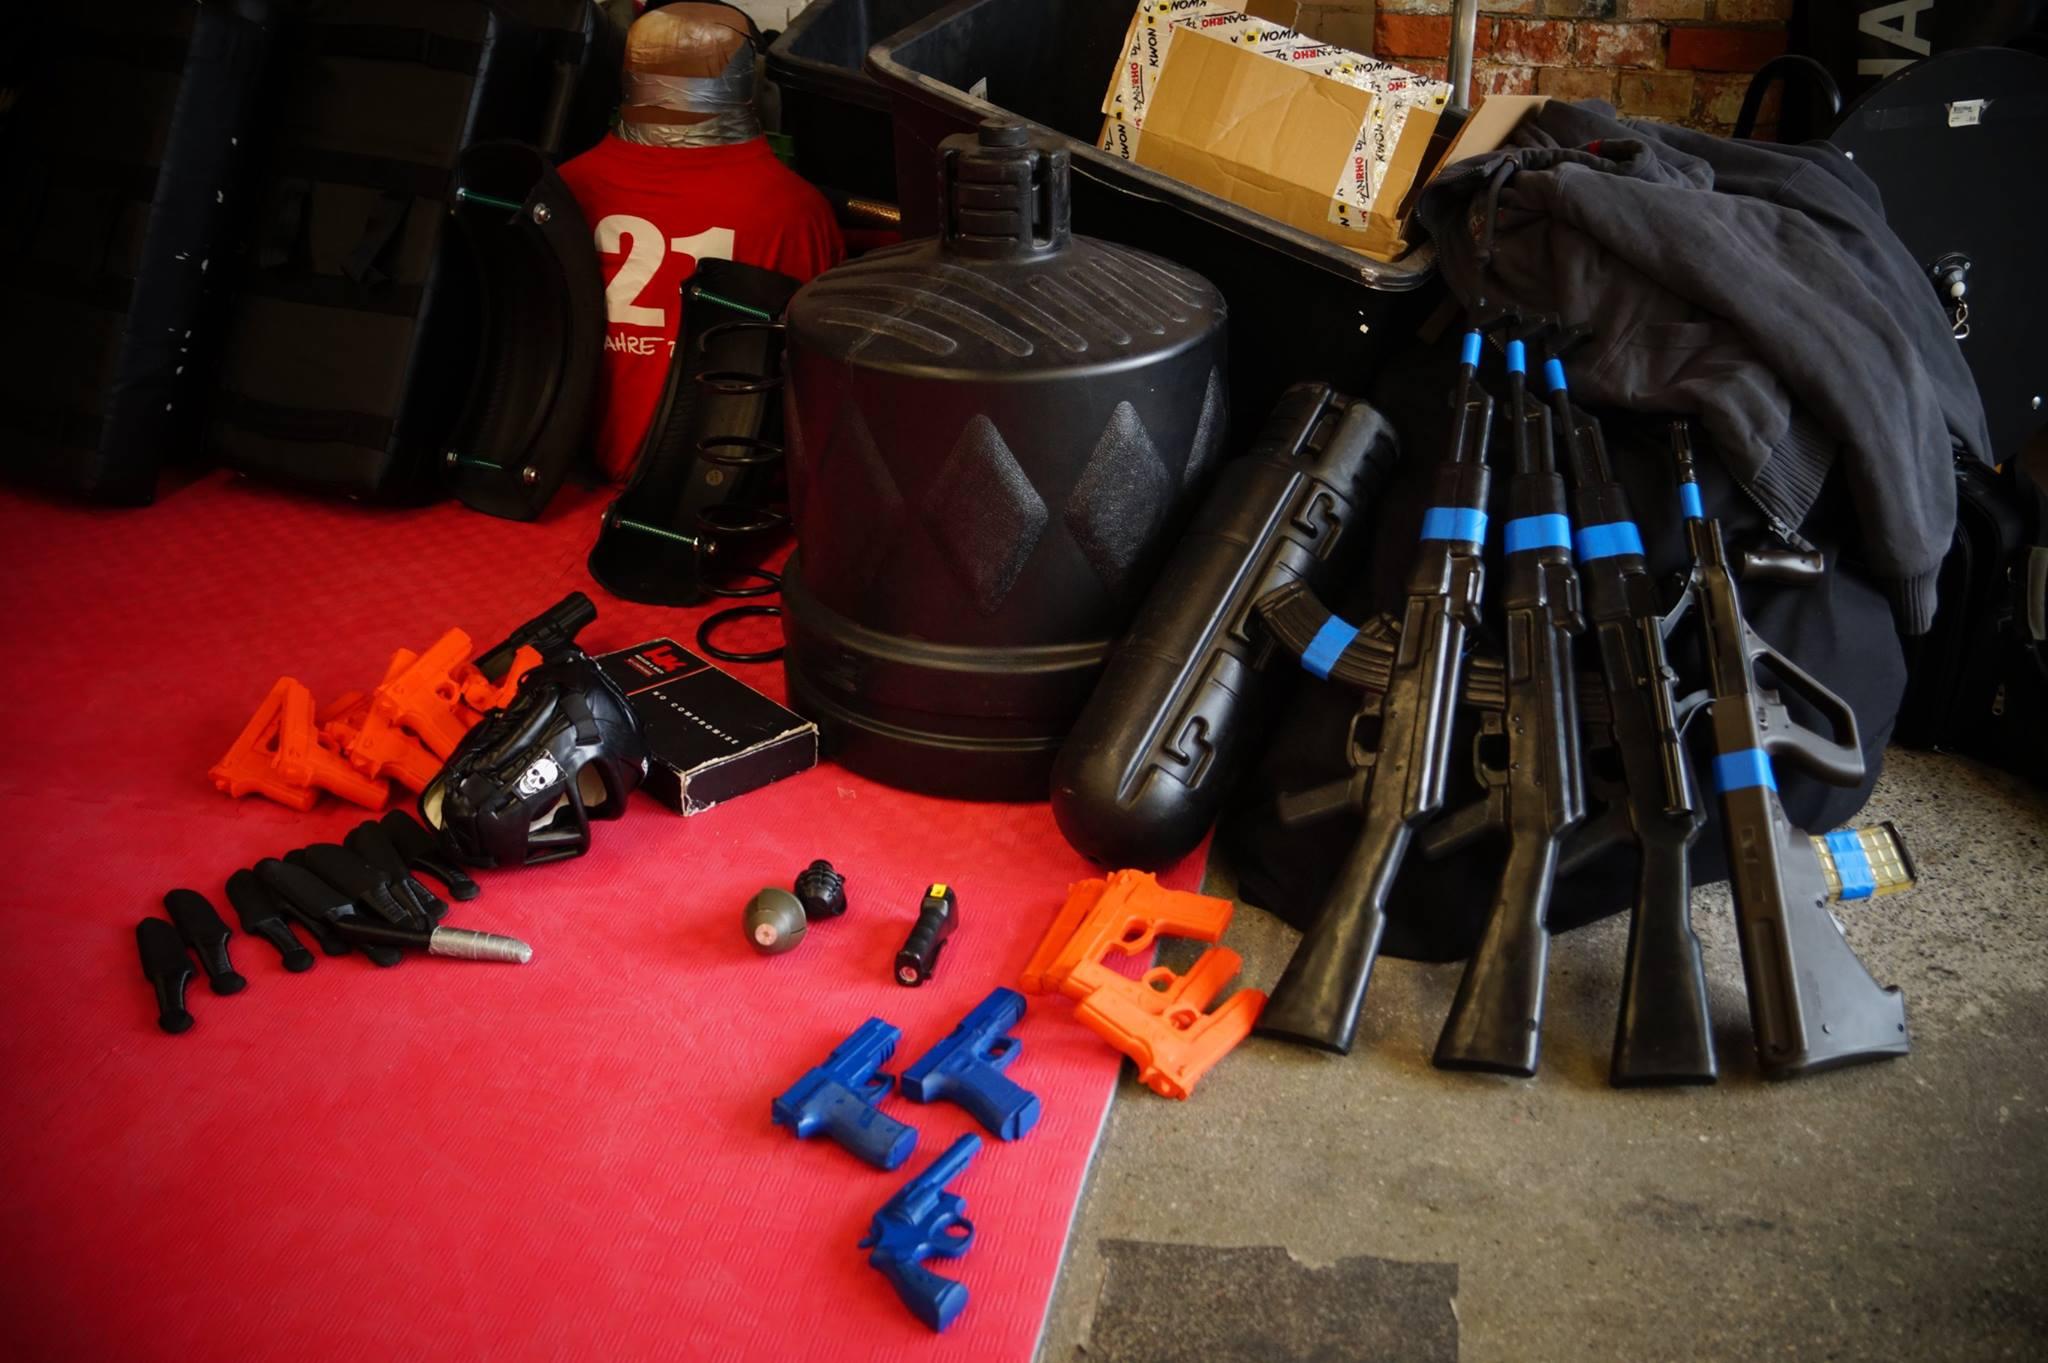 Lots of stuff...